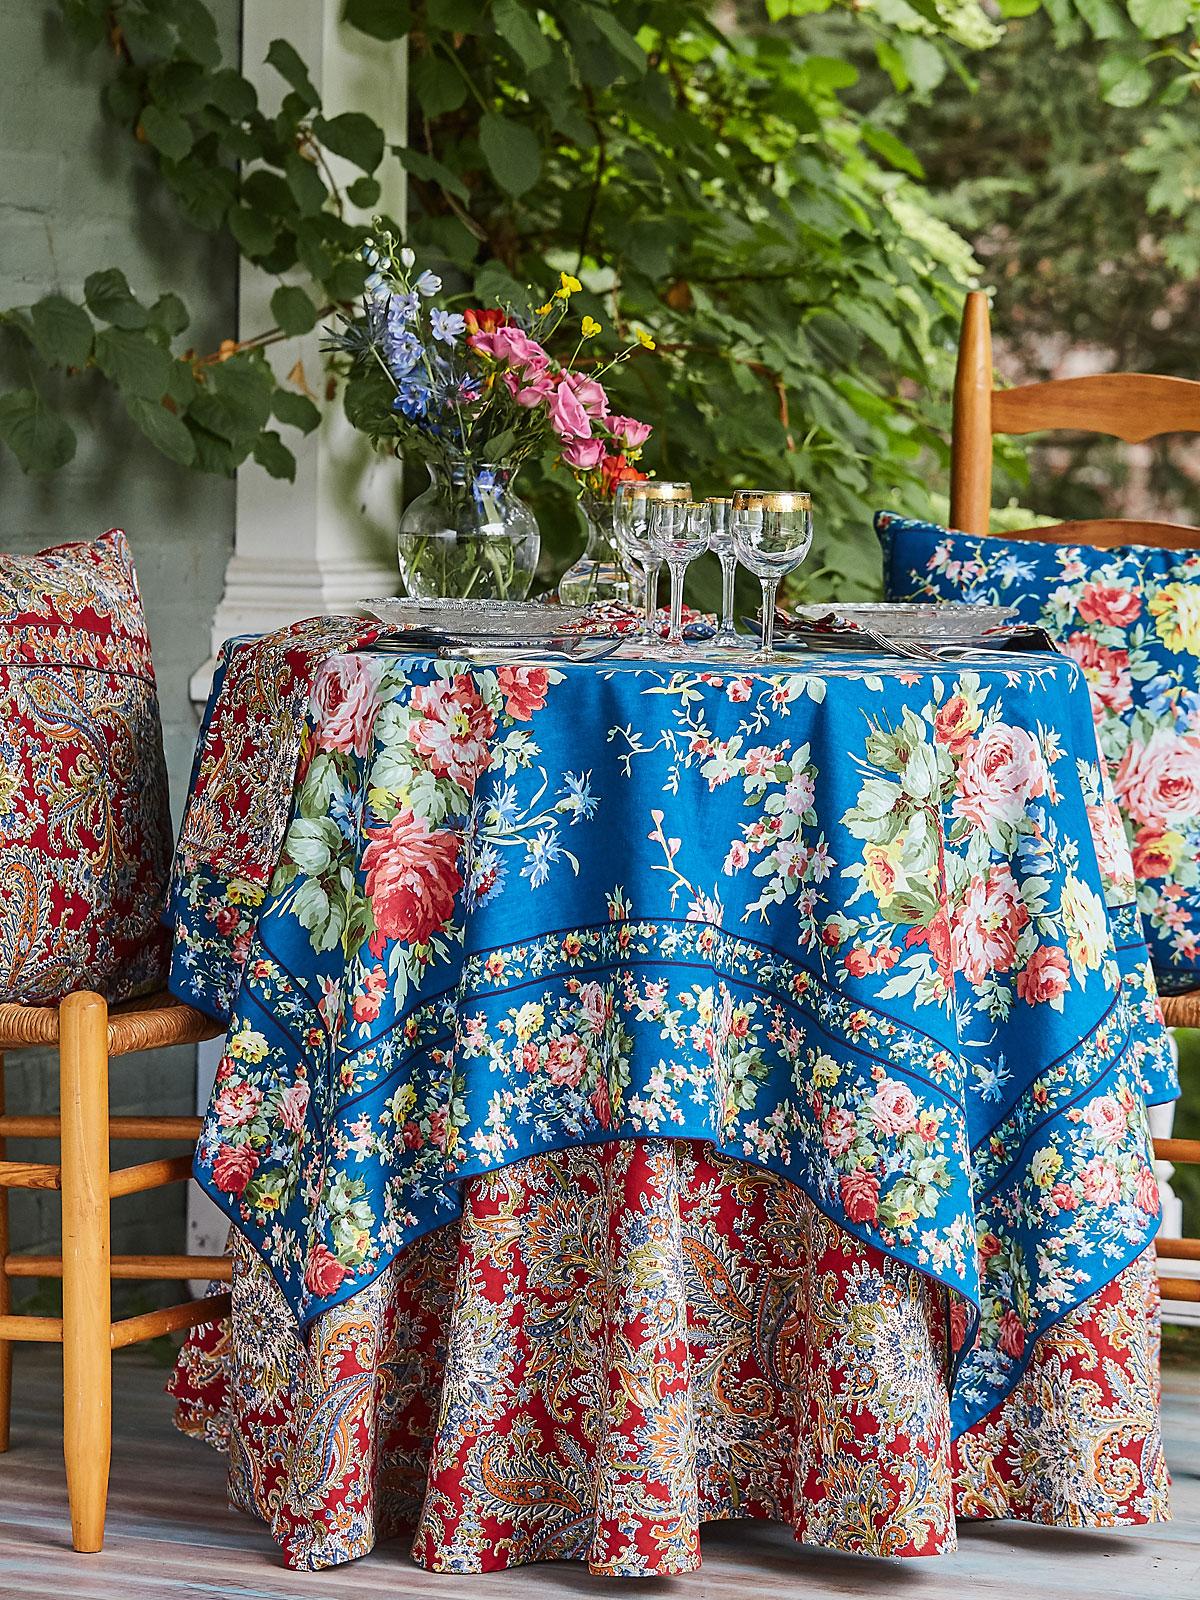 Everyday Beautiful Table Bundle